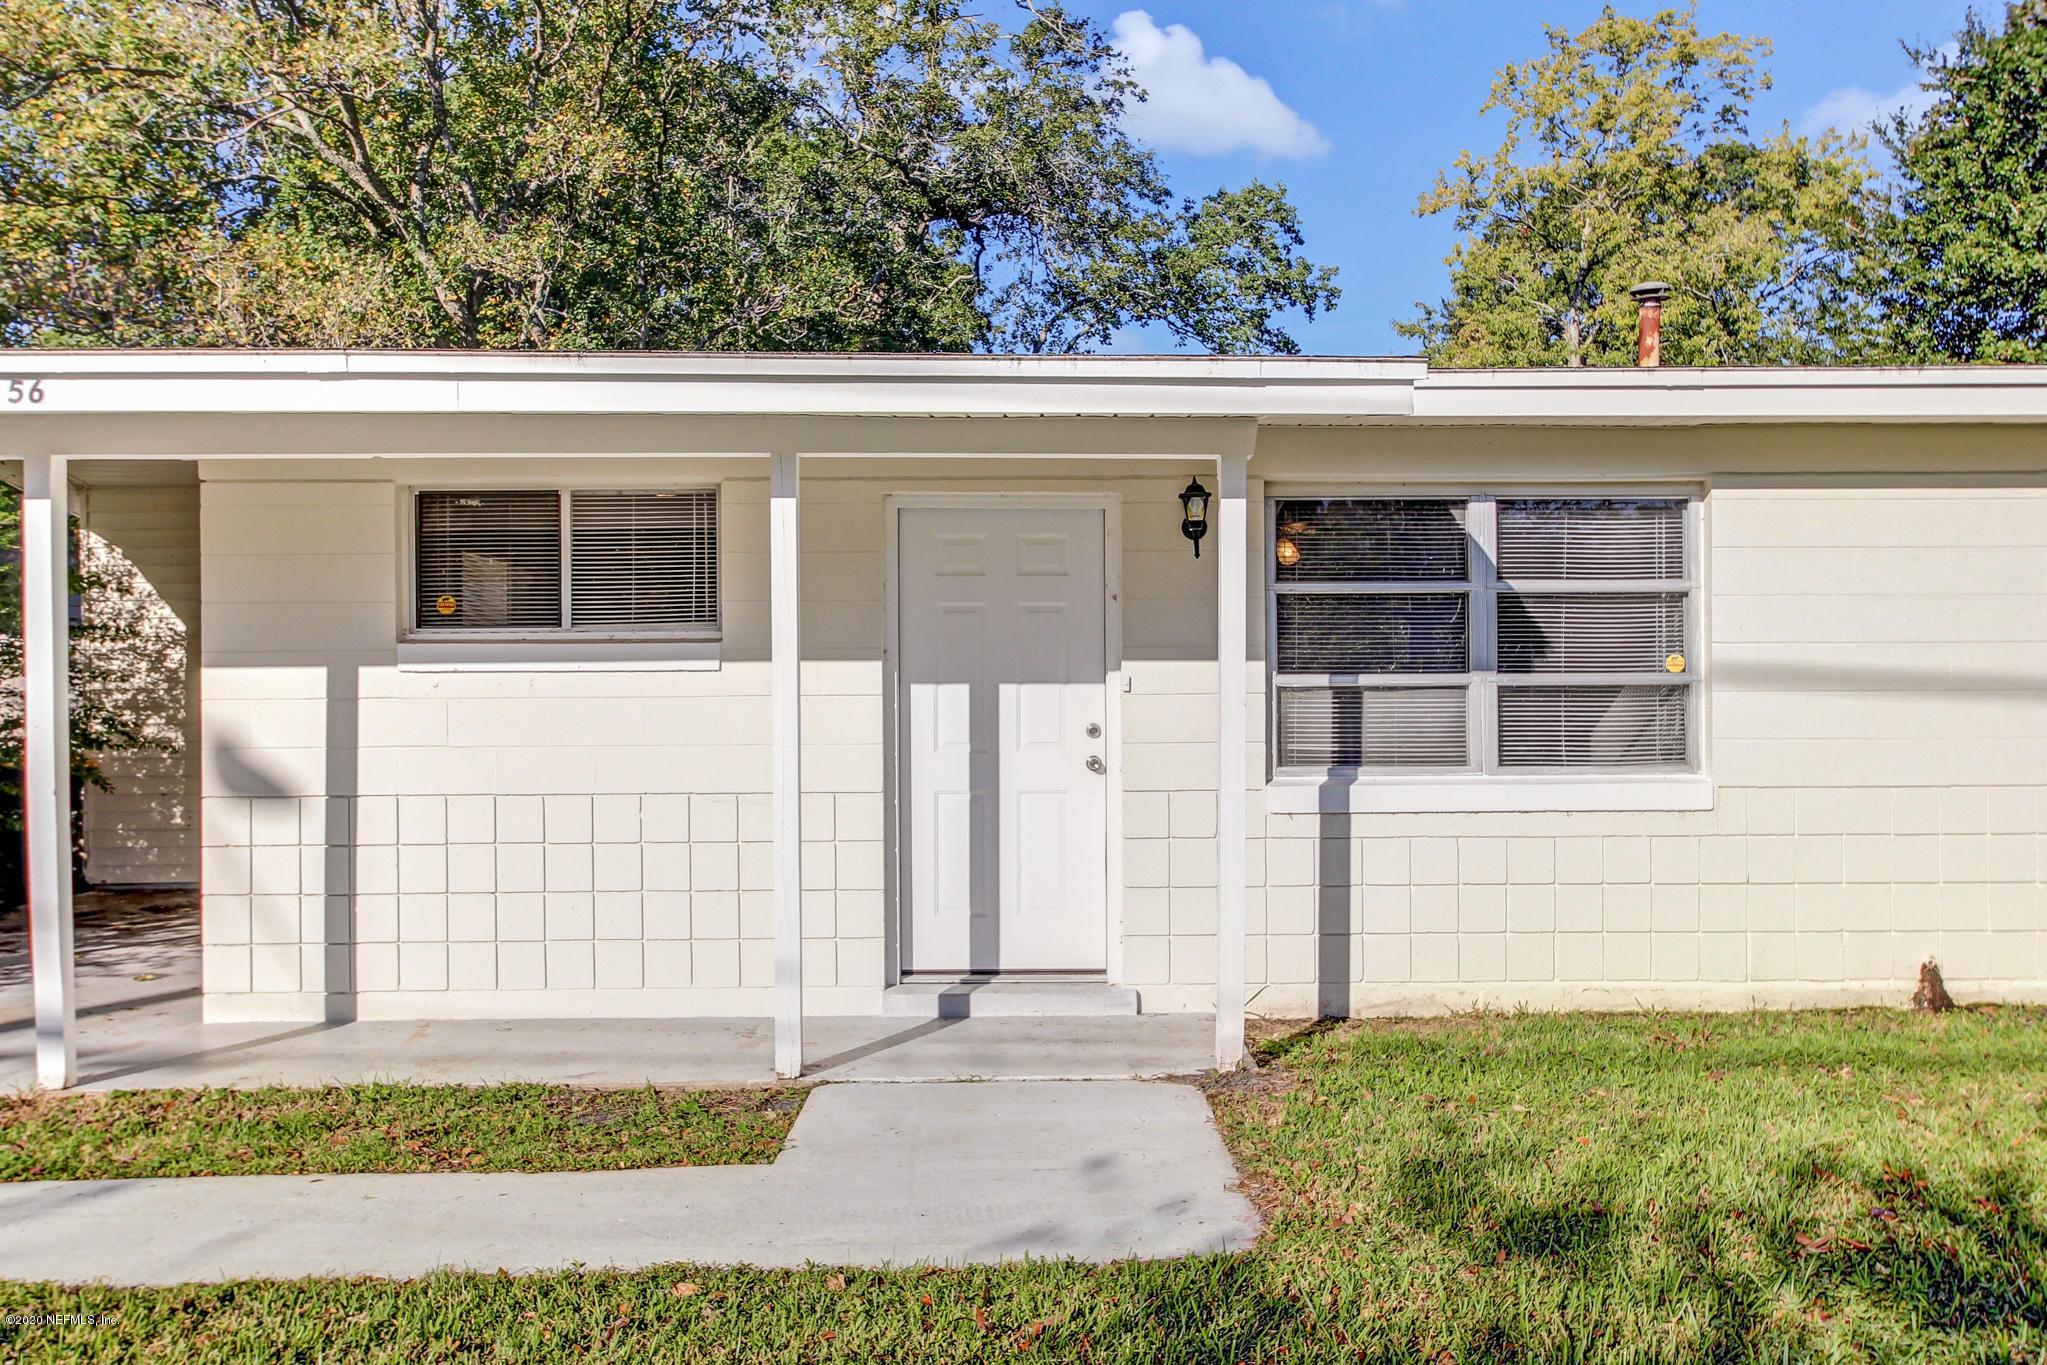 2156 BUNTING, JACKSONVILLE, FLORIDA 32210, 3 Bedrooms Bedrooms, ,2 BathroomsBathrooms,Rental,For sale,BUNTING,1033732